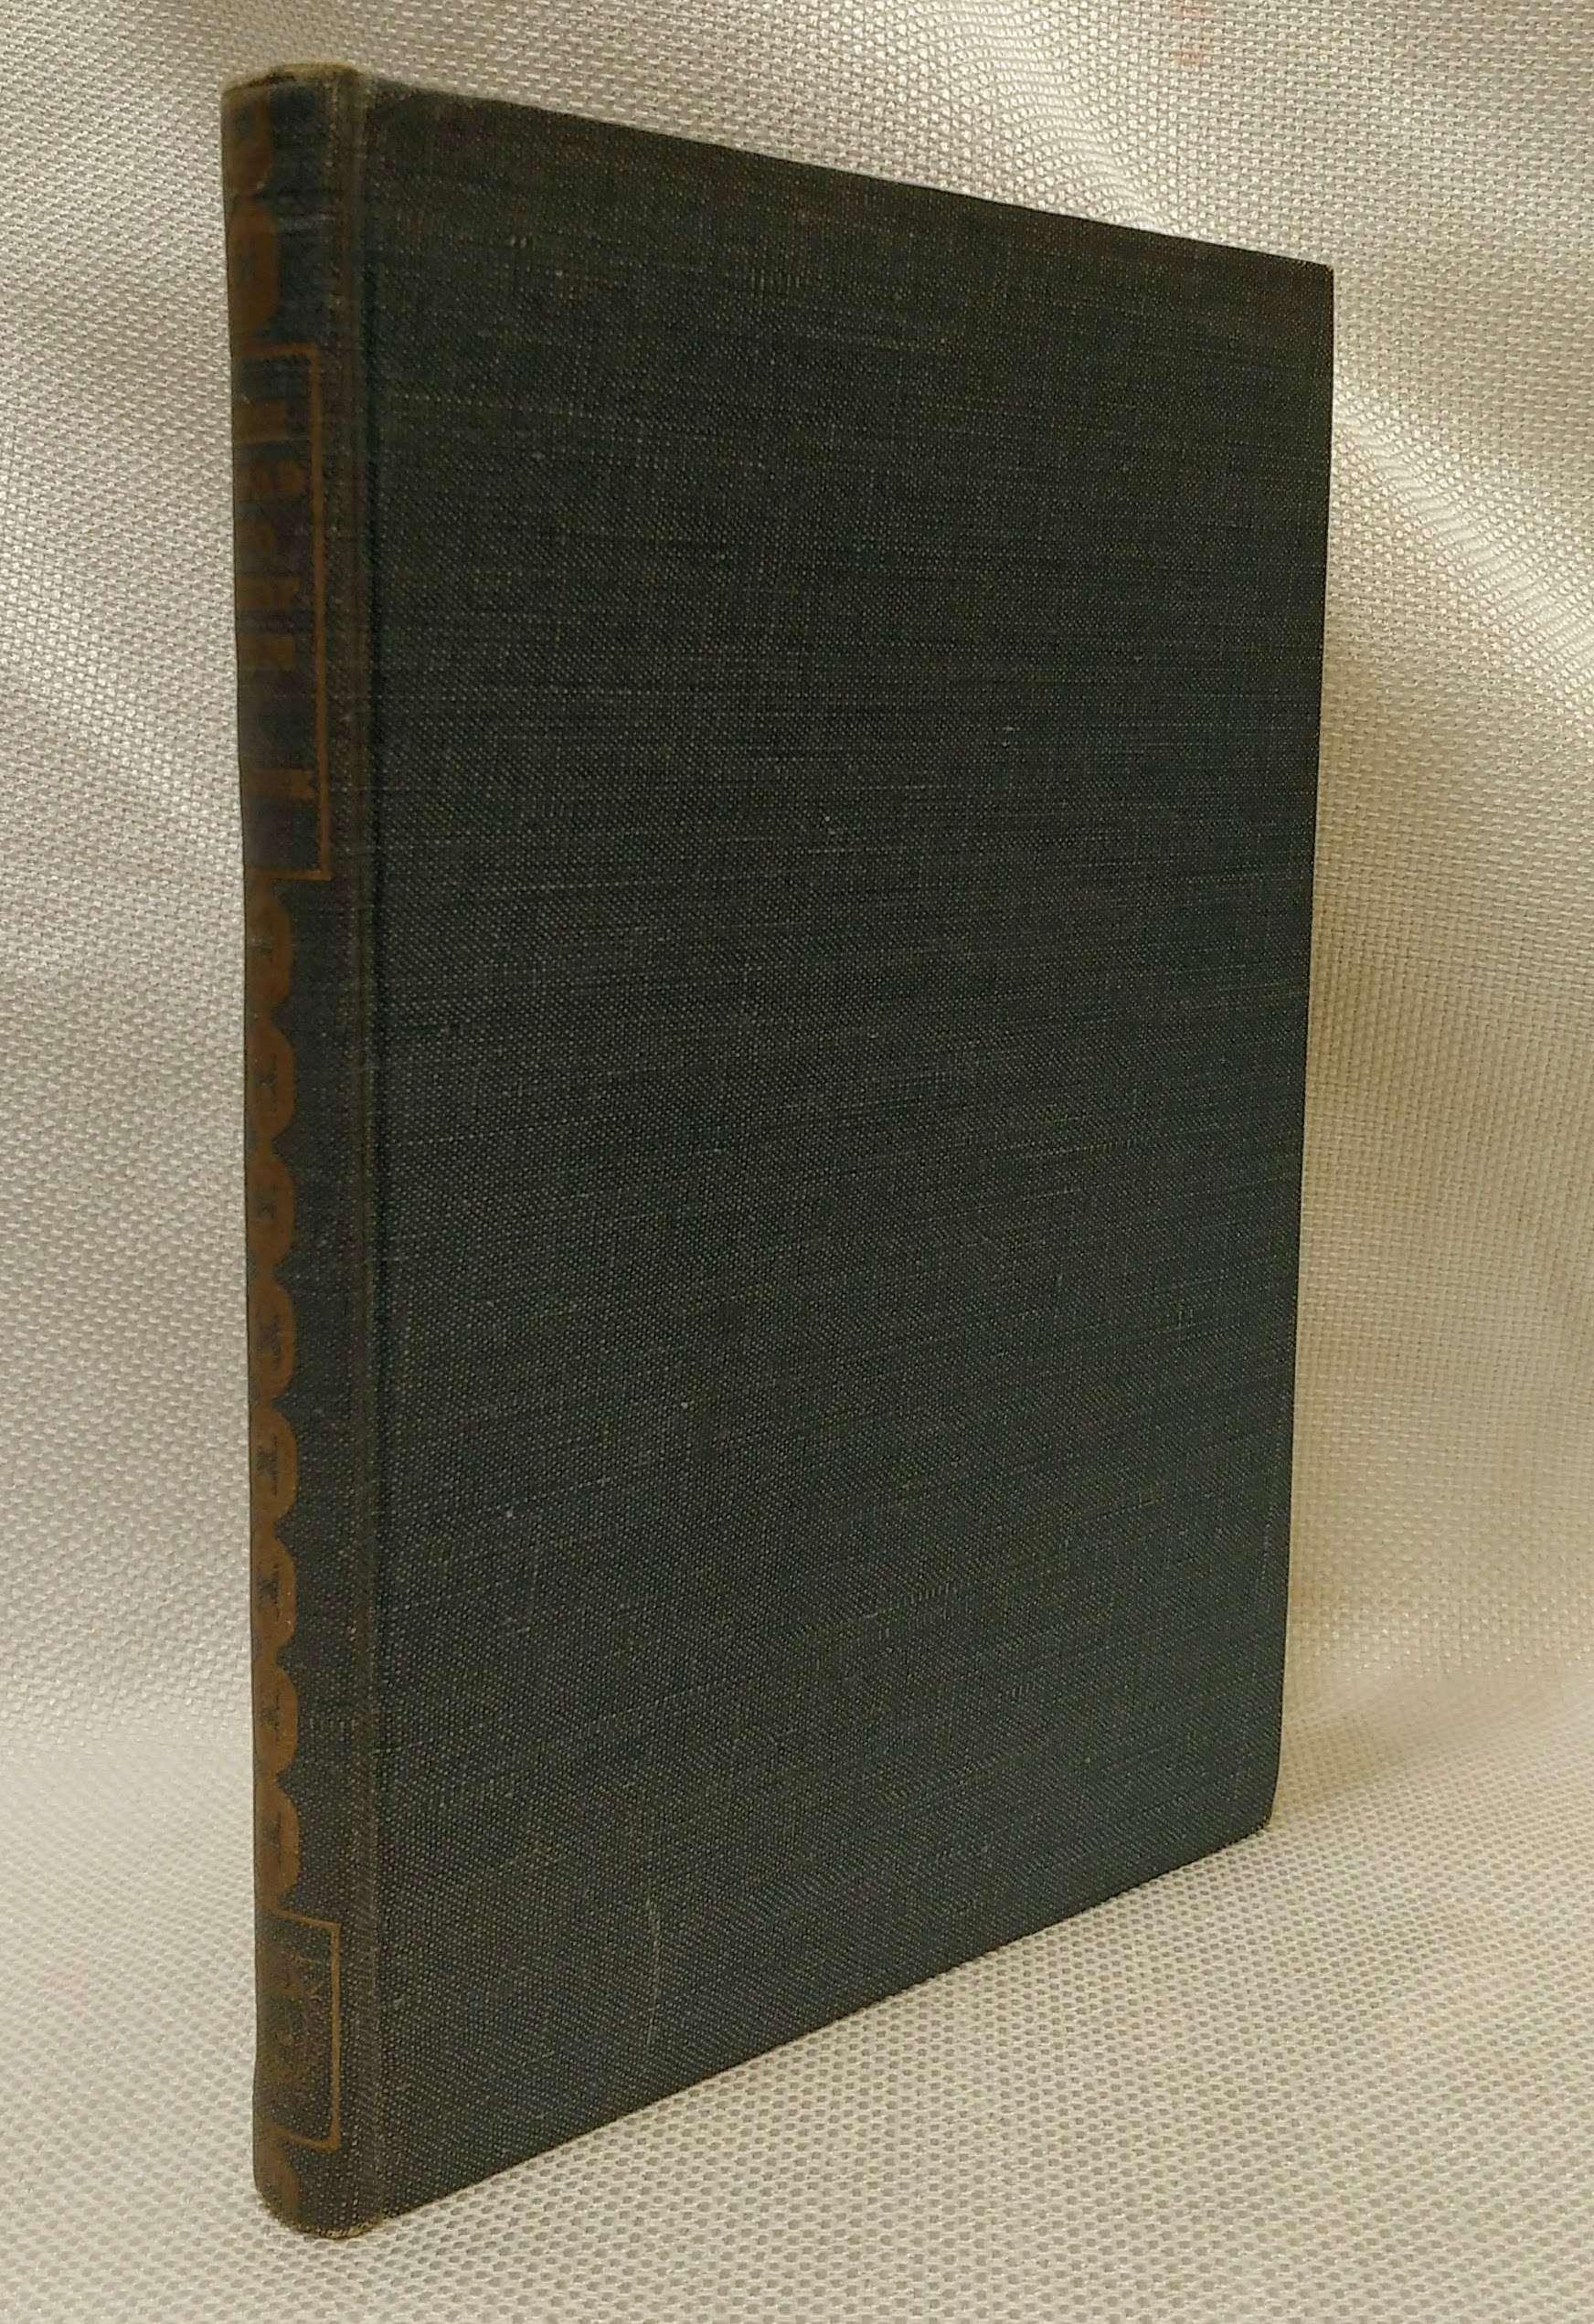 Road to Serfdom by Hayek, Friedrich A. published by Univ. of Chicago Press Hardcover, Hayek, Friedrich A.